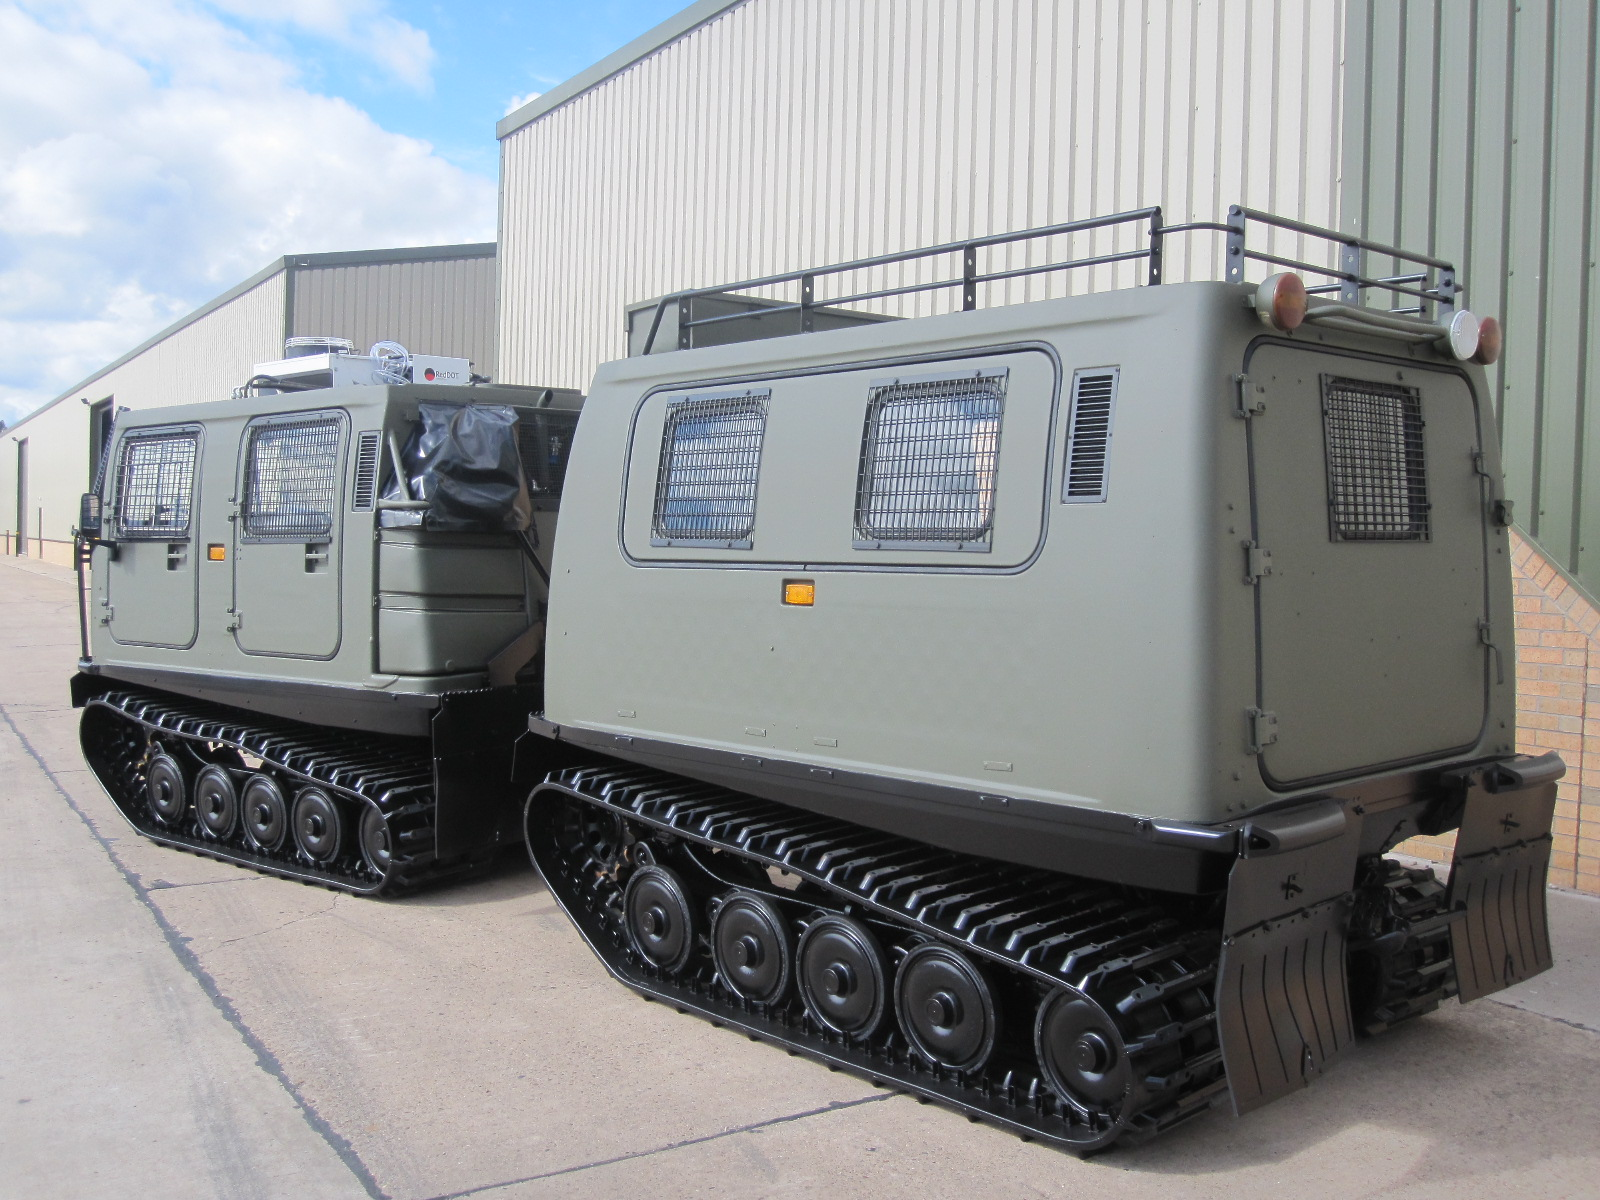 Hagglund BV206 Personnel Carrier (Petrol/Gasolene) for sale